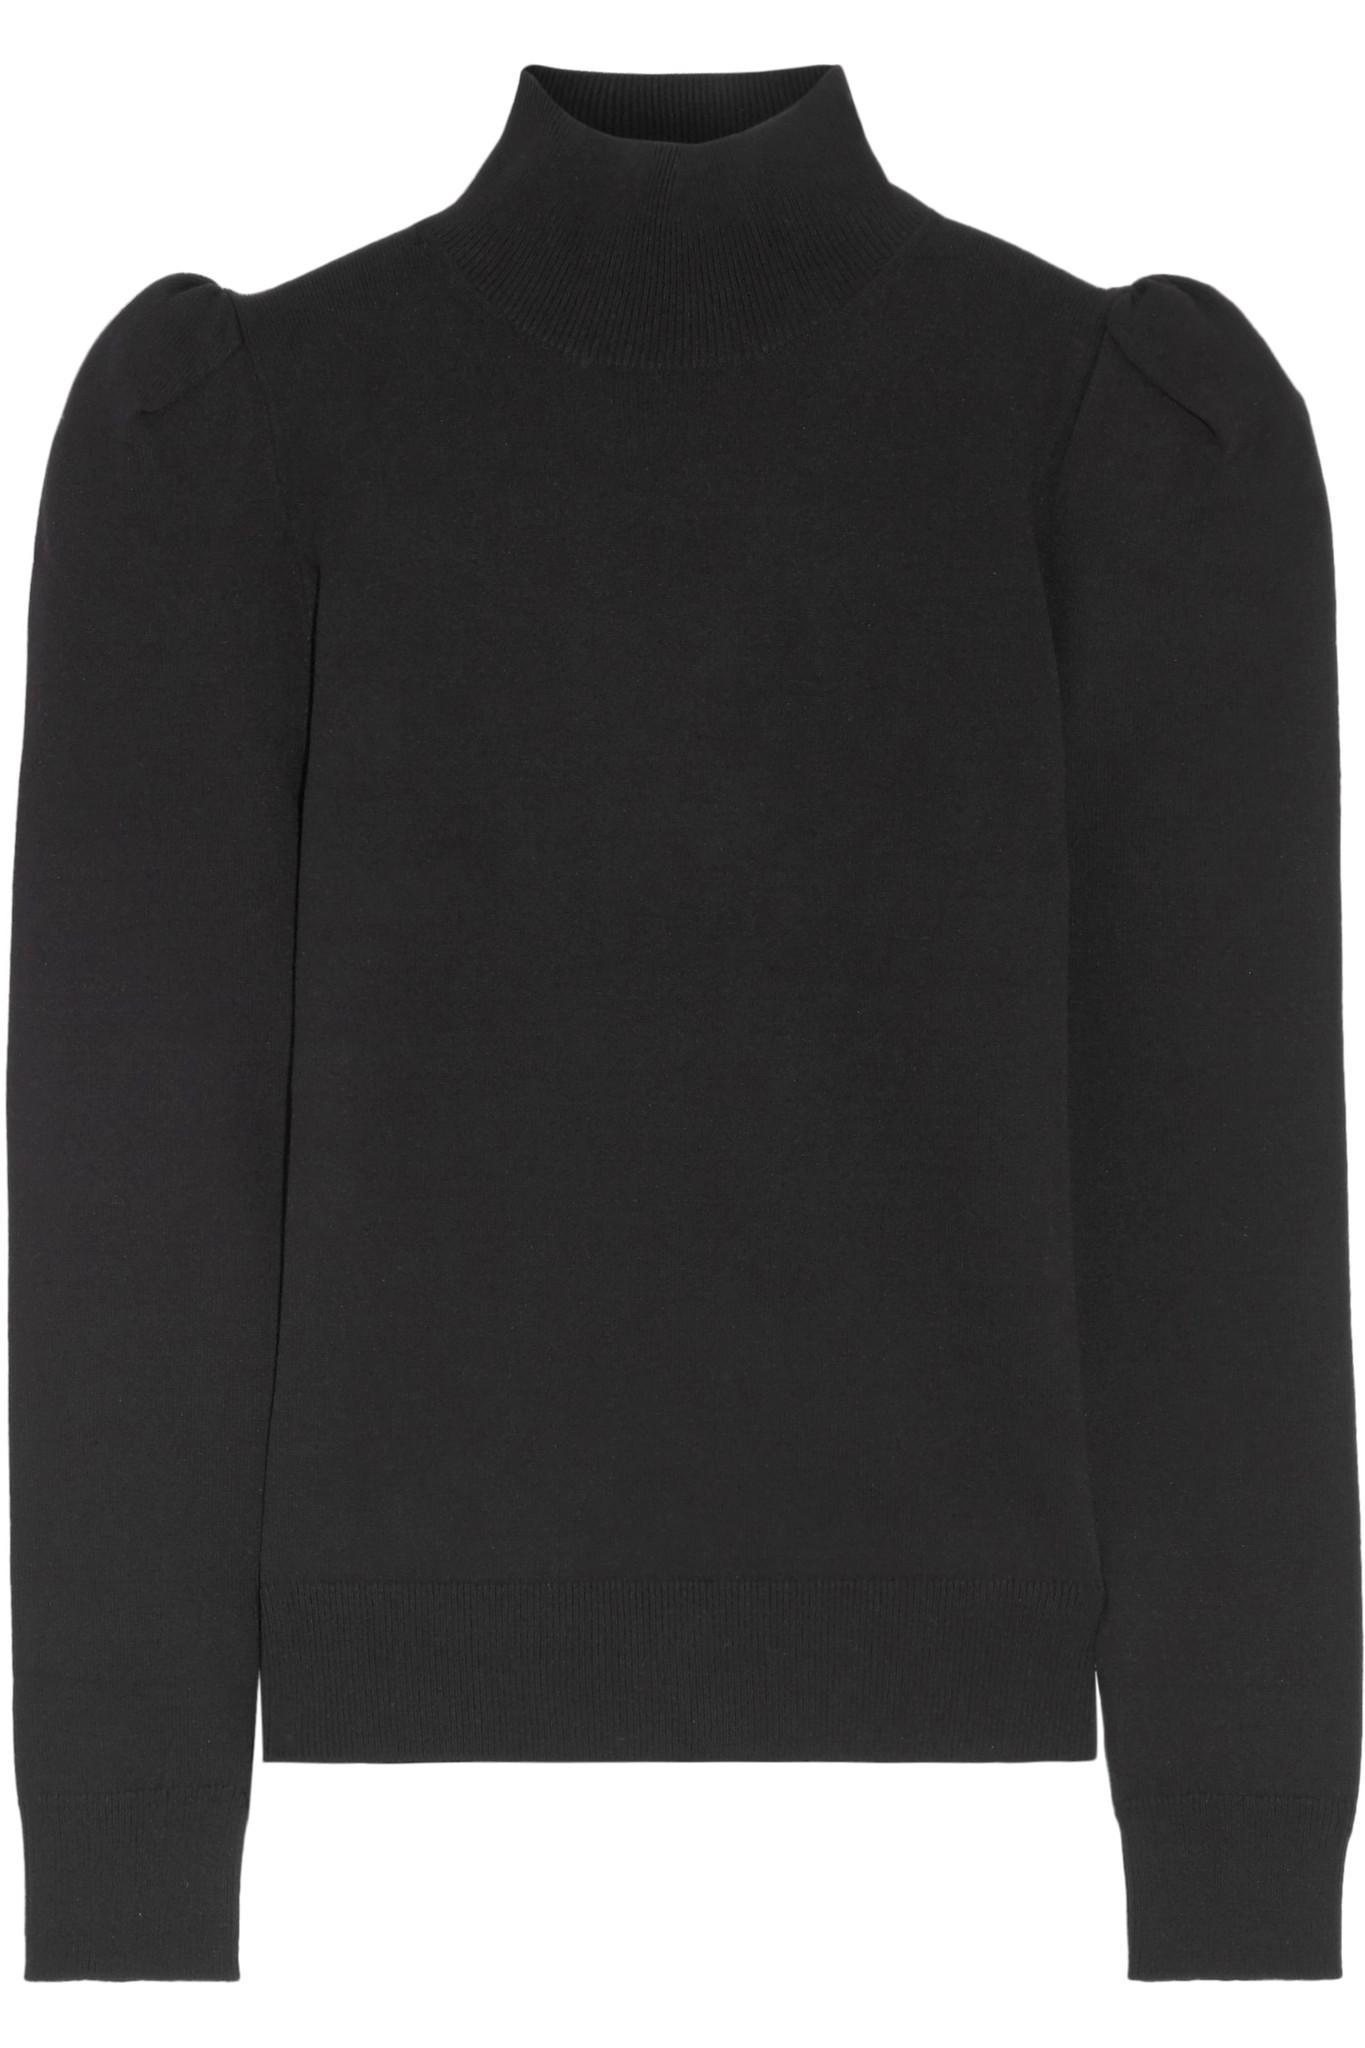 Co turtleneck sweater Sneakernews Online vCQt1Gh